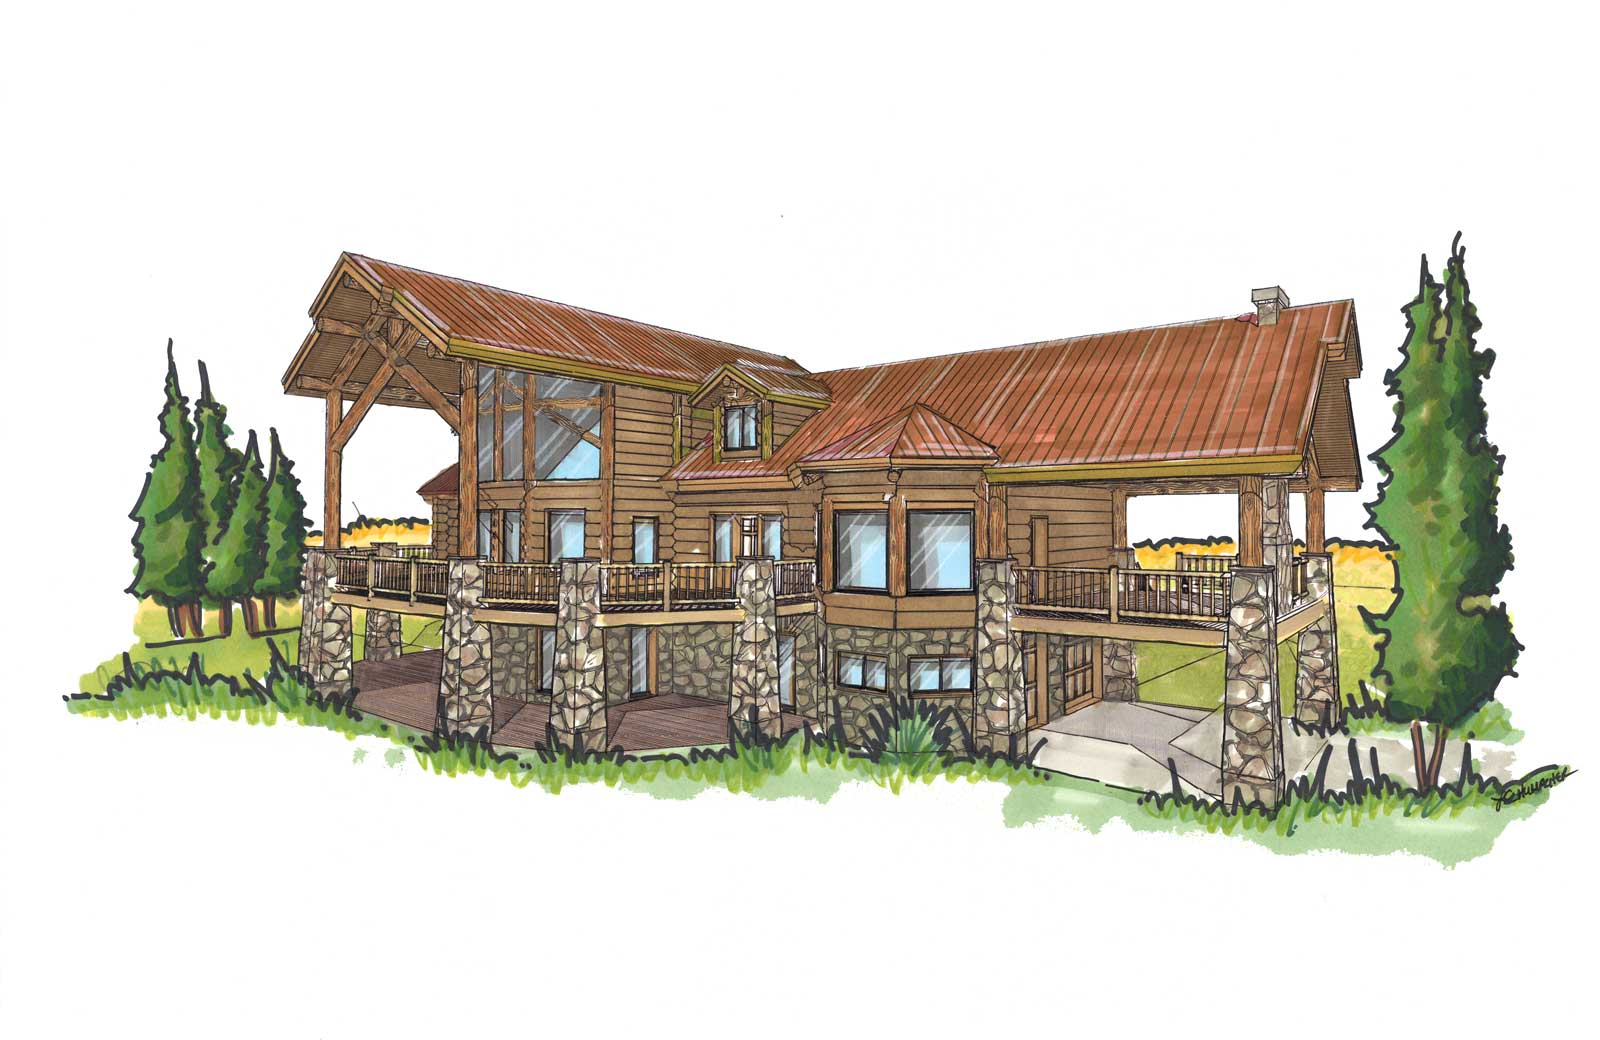 Telluride custom designed log home back right view